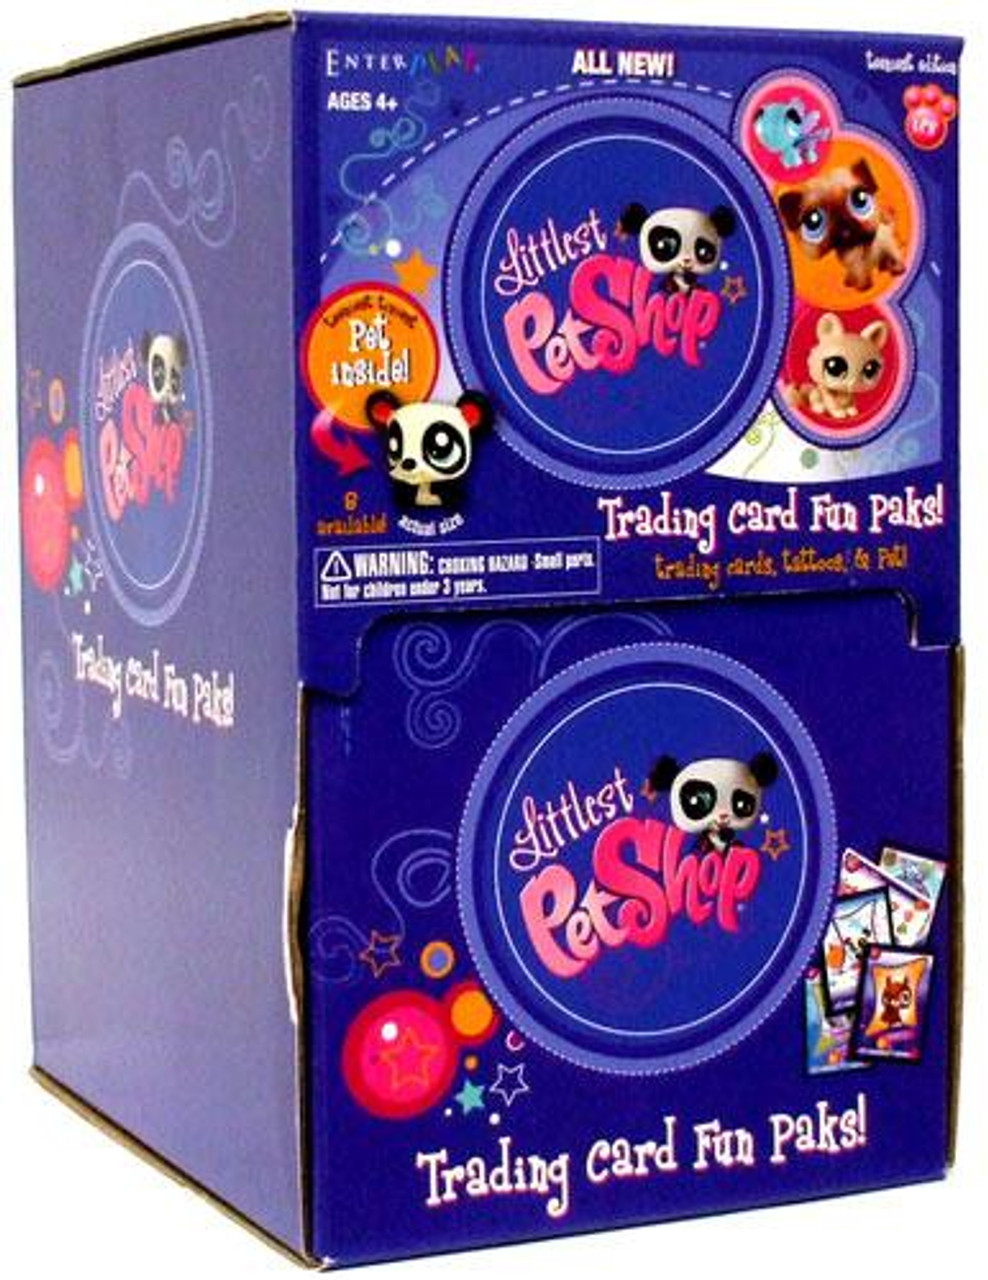 Littlest Pet Shop Teeniest Edition Trading Card Box